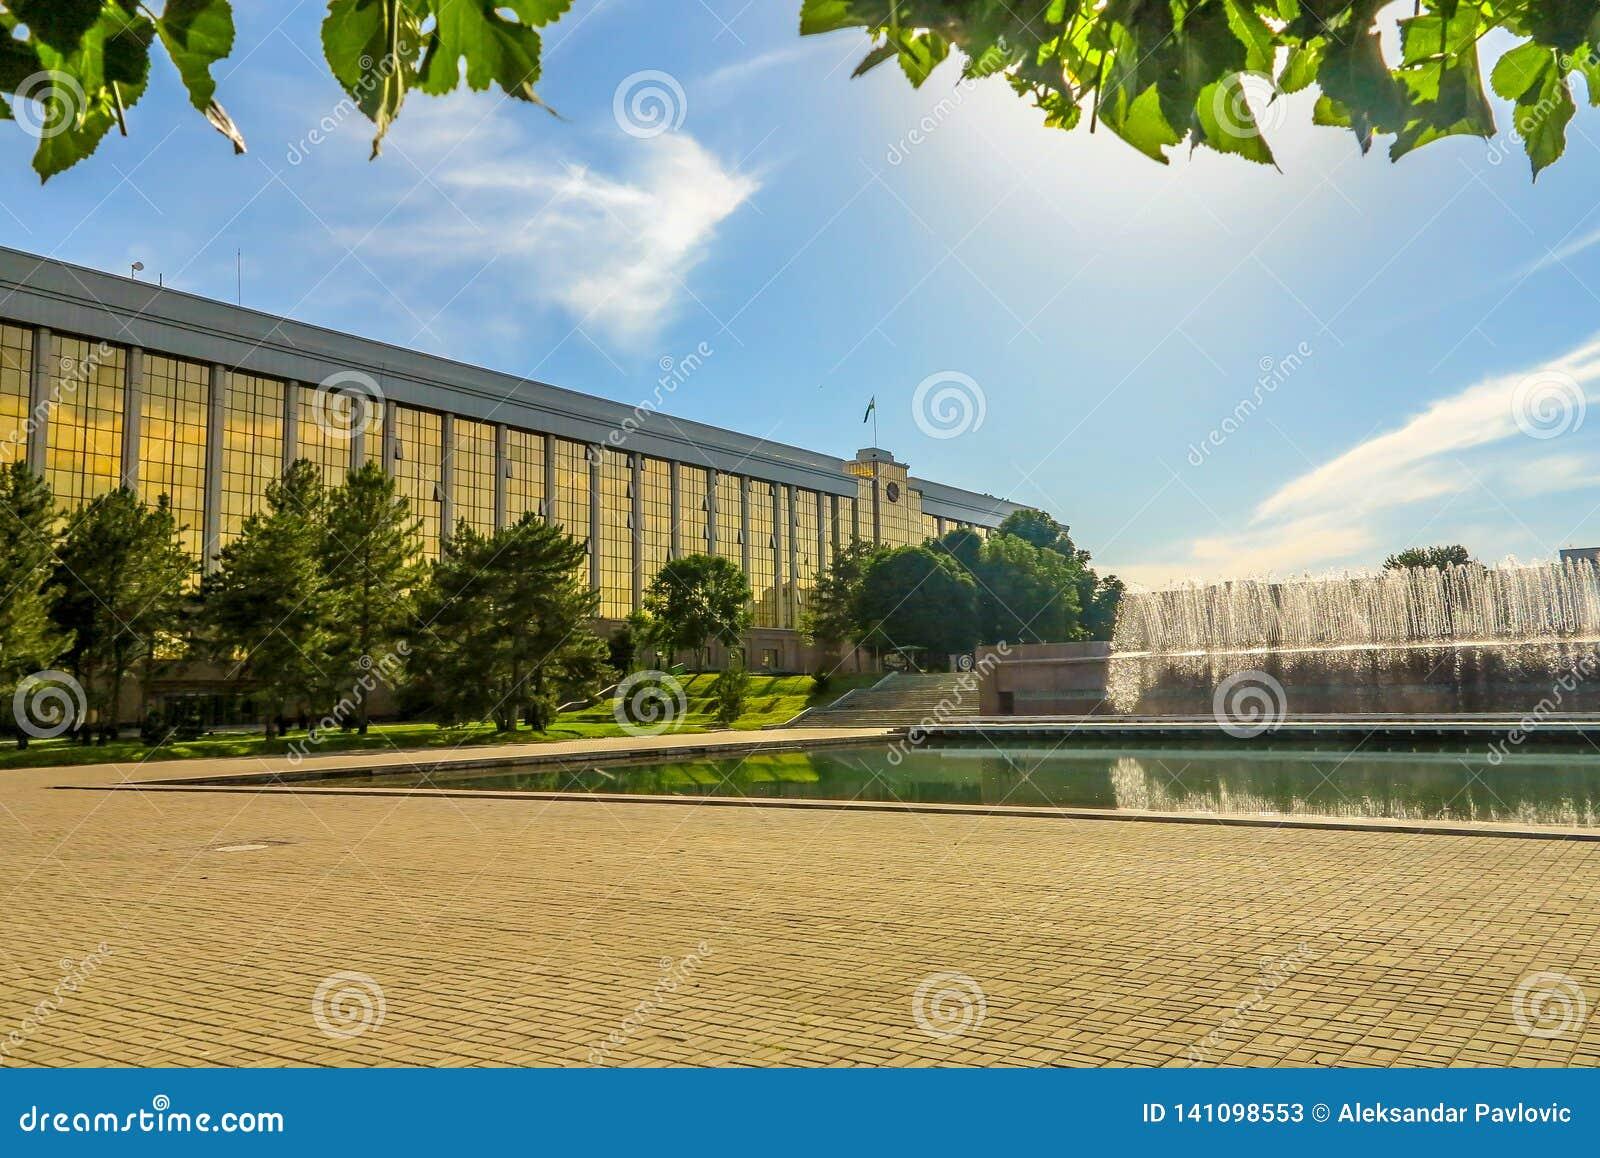 Ташкент Mustaqilliq Maidoni 05